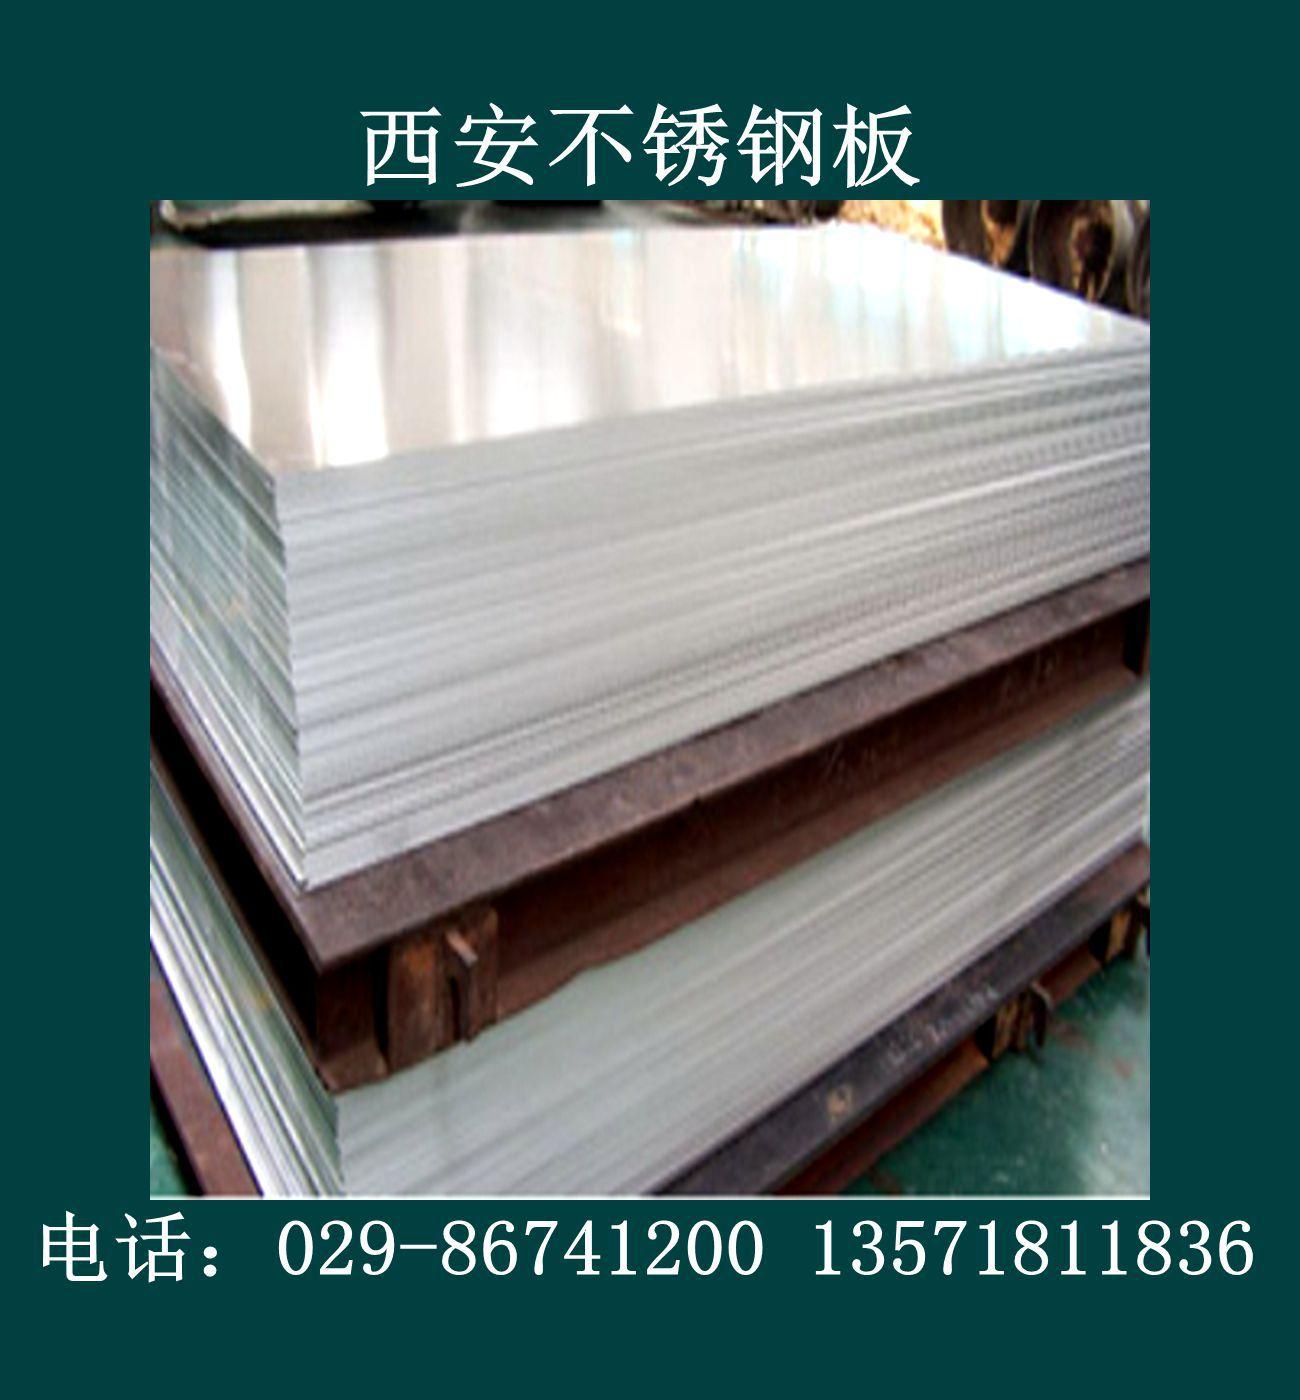 和田不锈钢板321不锈钢板304不锈钢板316不锈钢板厂家直销